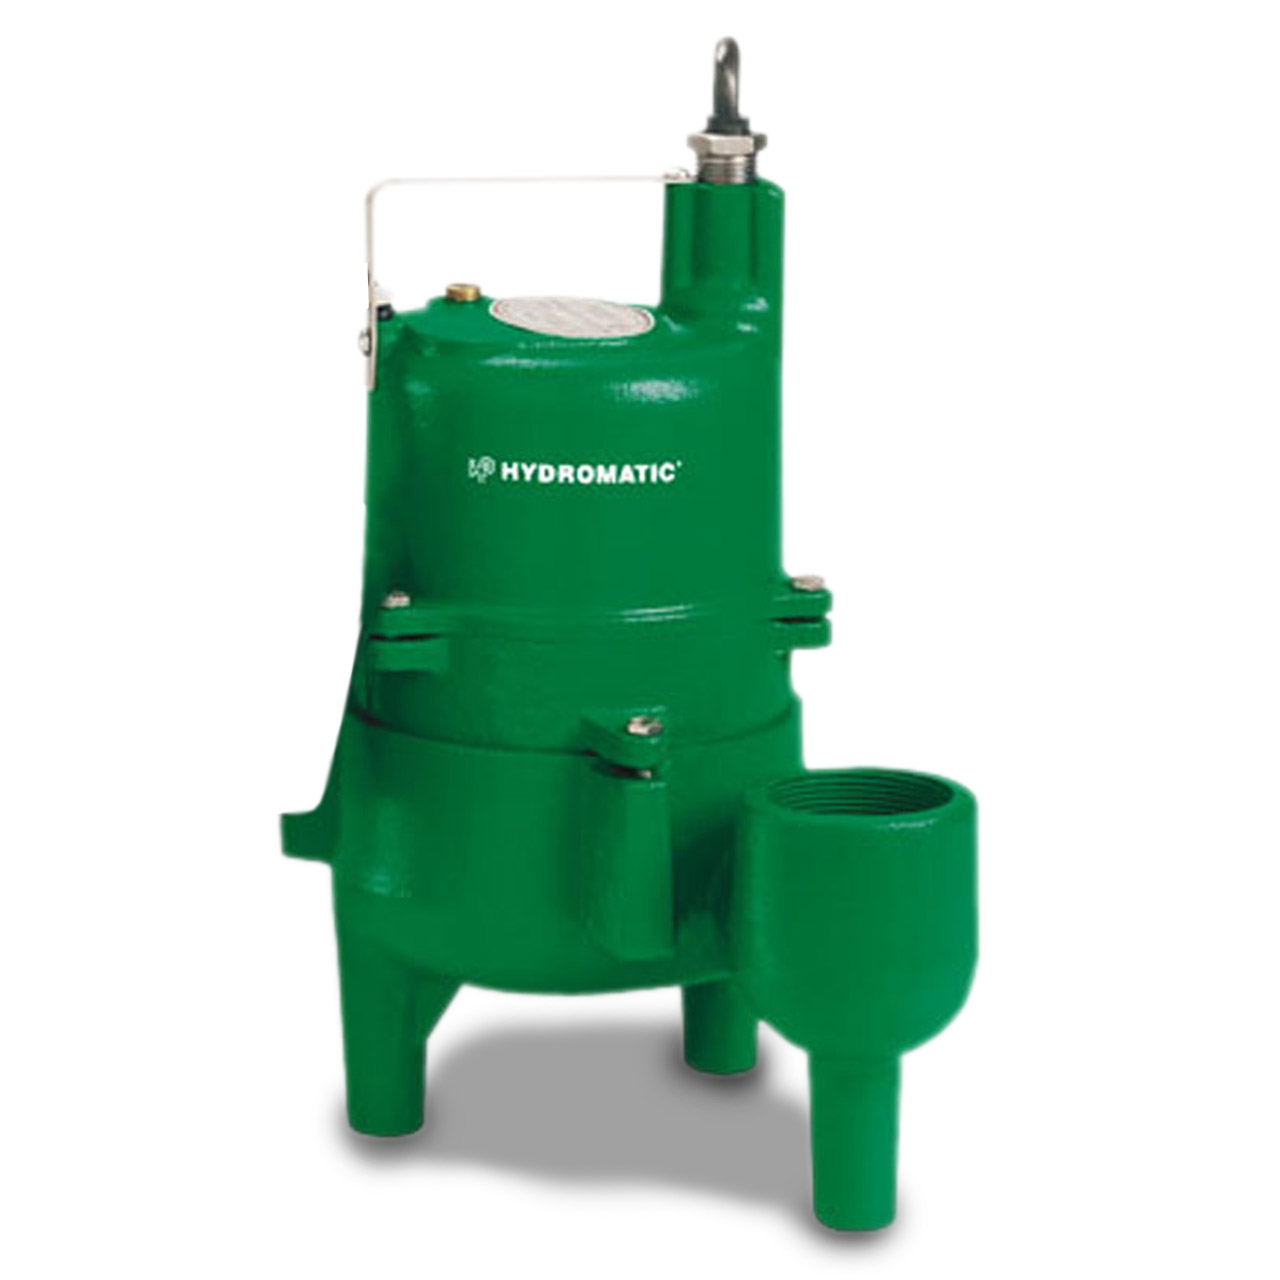 Hydromatic Pump Hydromatic Skv40m2 Submersible Sewage